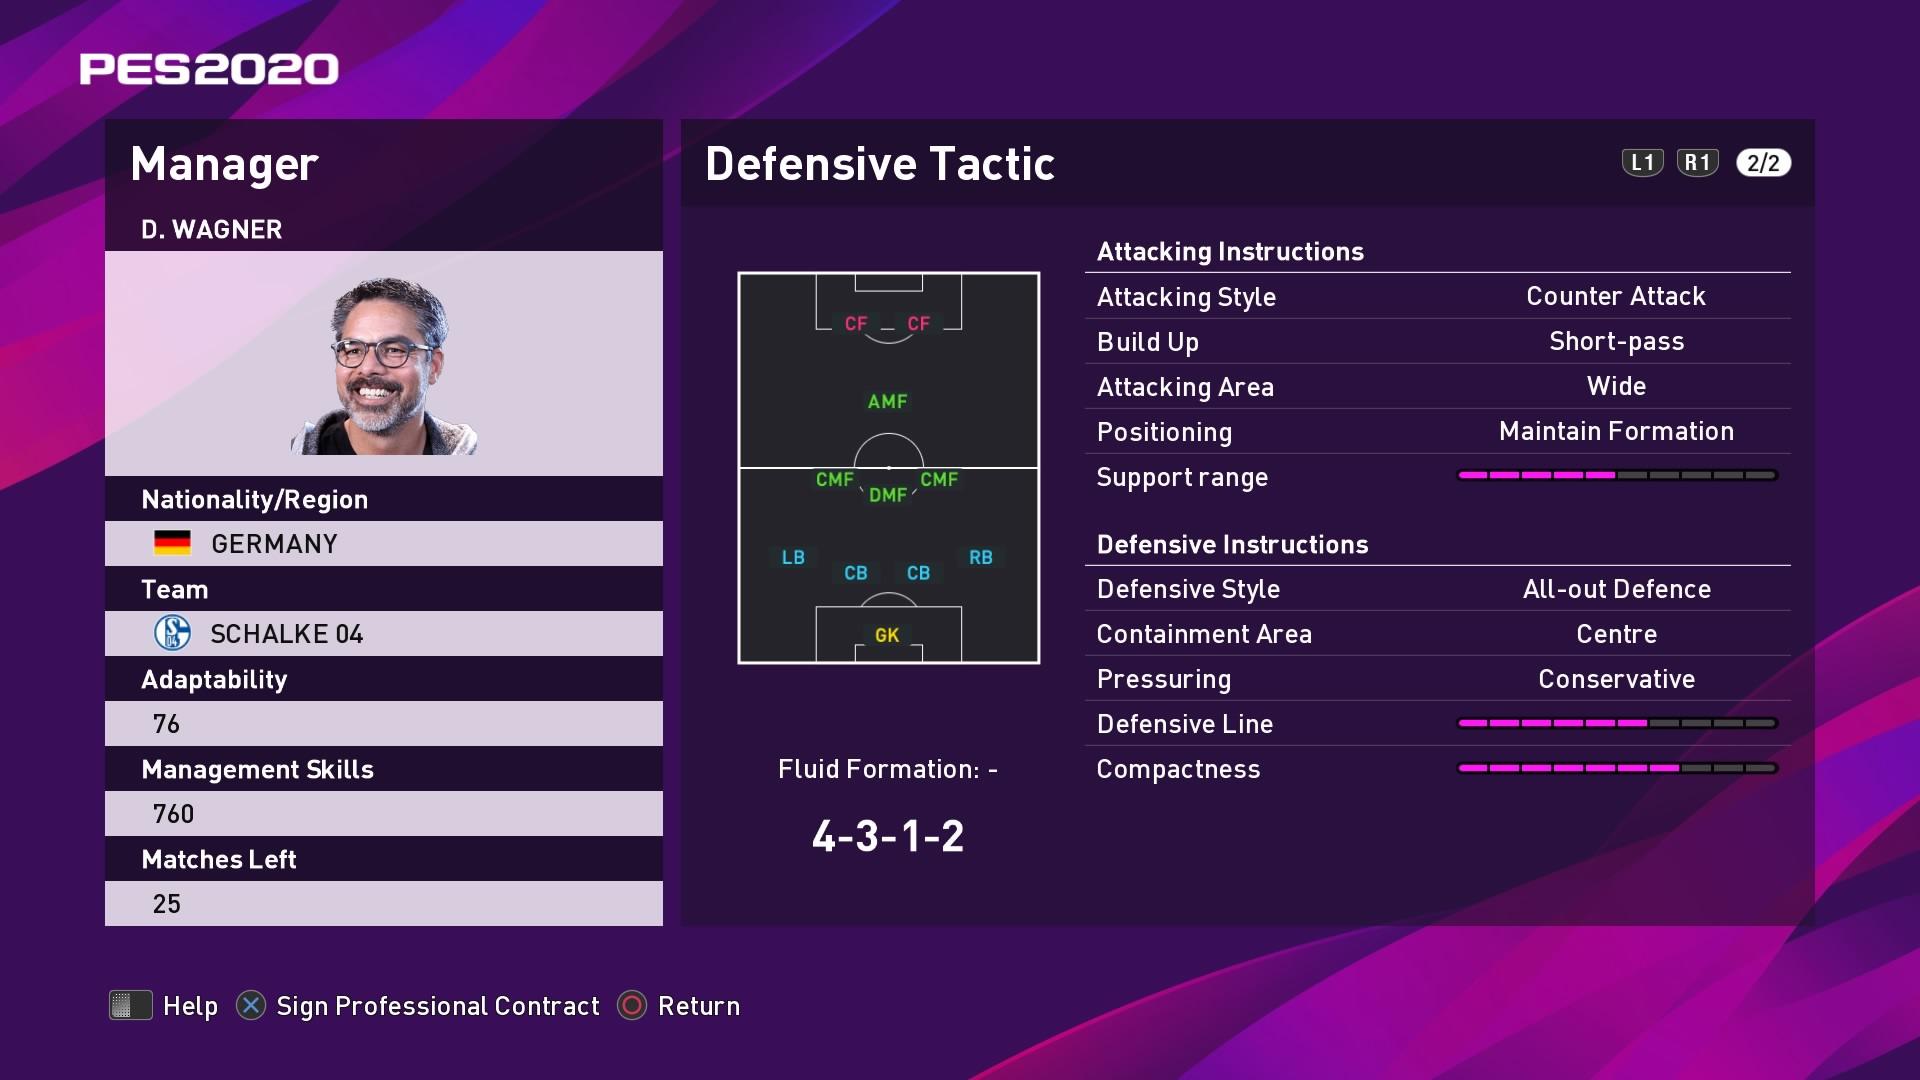 D. Wagner (David Wagner) Defensive Tactic in PES 2020 myClub